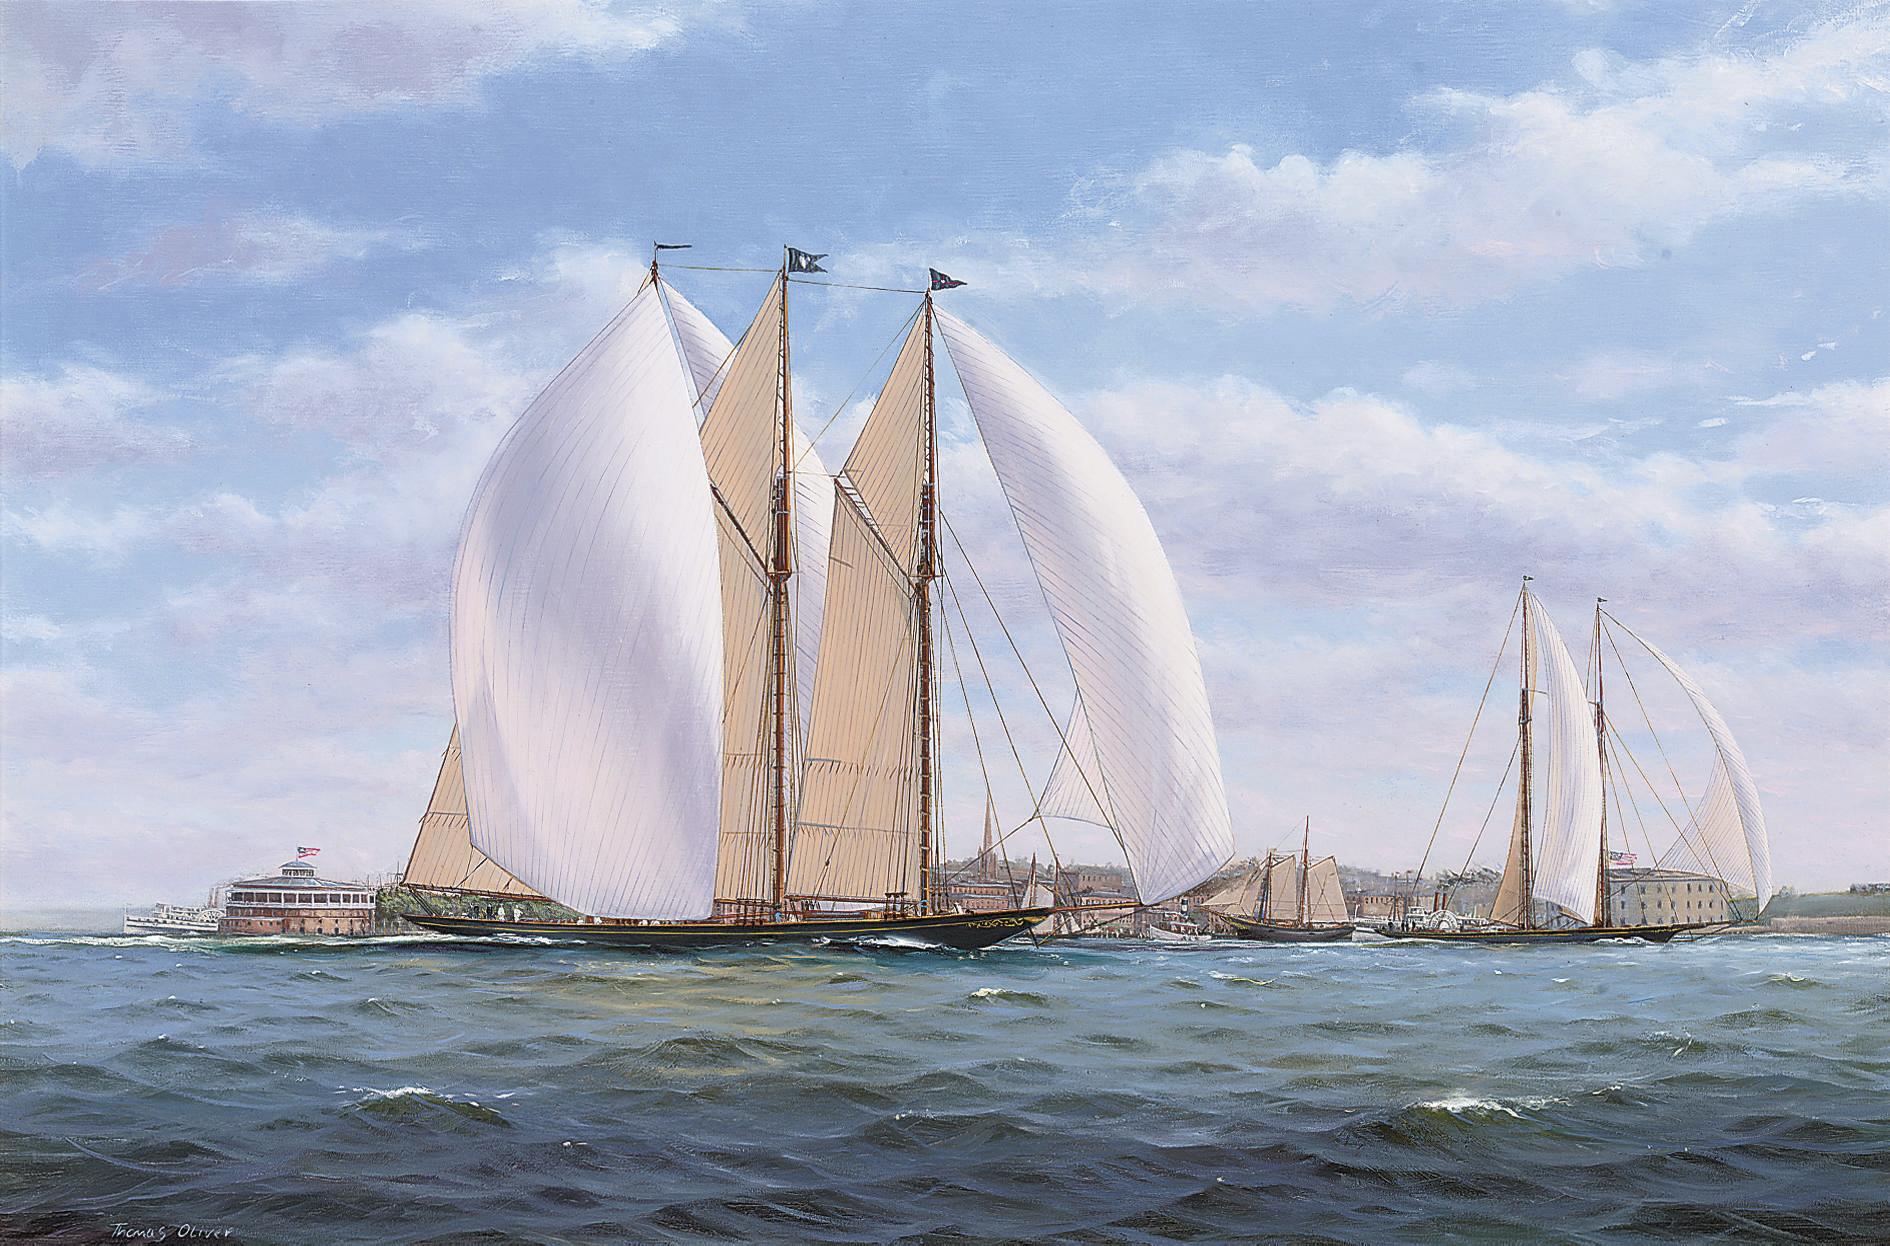 The New York Yacht Club's three-masted racing schooner Atlantic racing off Castle Gardens, New York Harbour, 1905